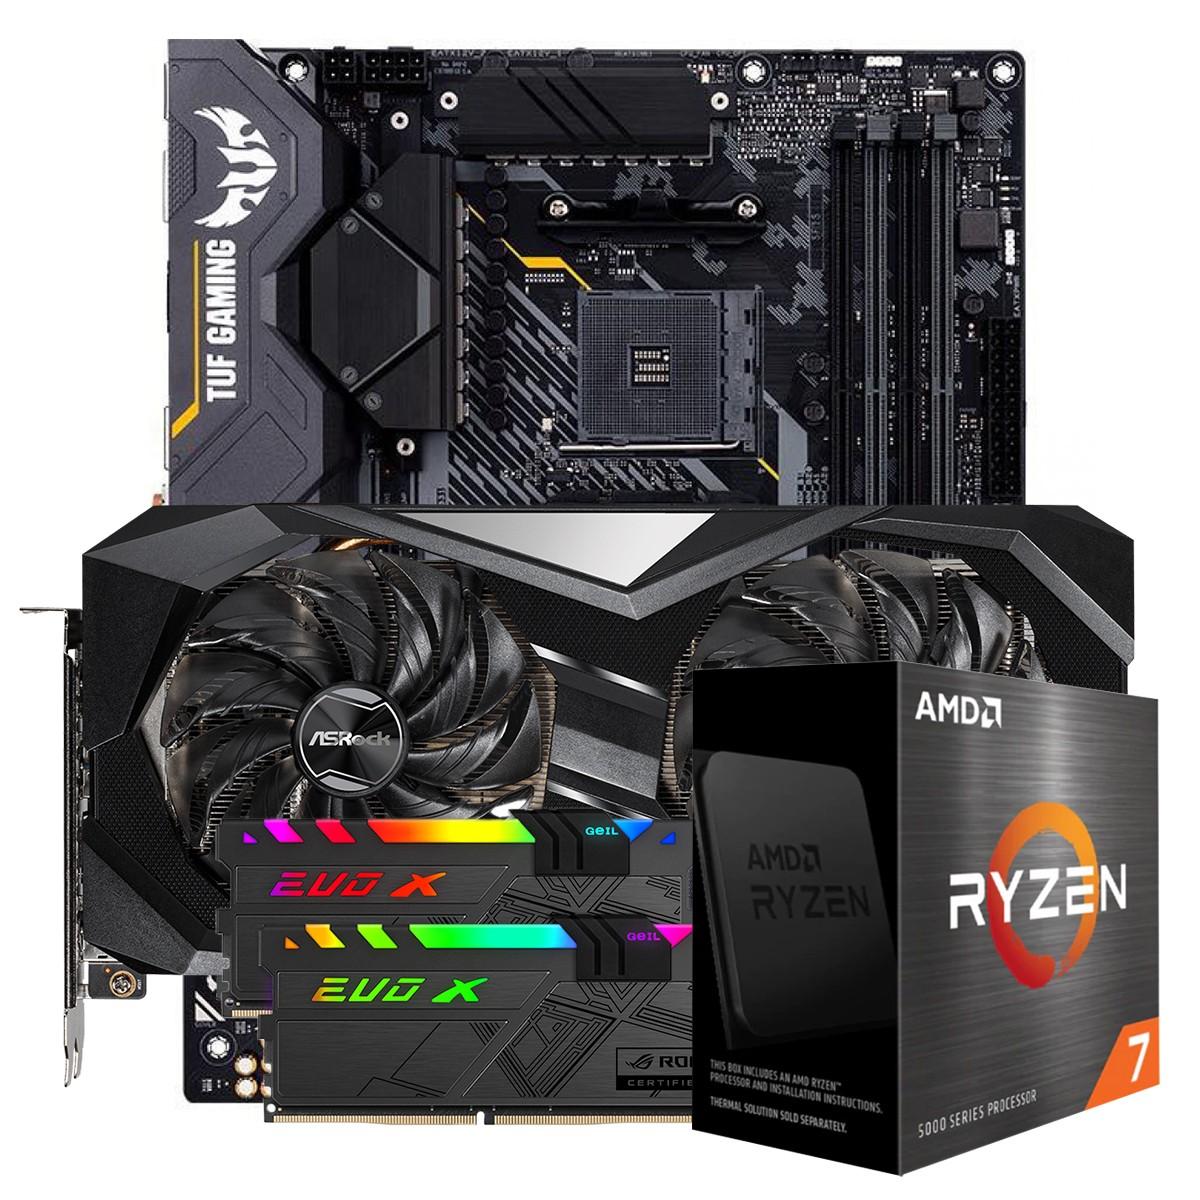 Kit Upgrade ASRock Radeon RX 6700 XT Challenger + AMD Ryzen 7 5800X + ASUS TUF Gaming X570-Plus + Memória DDR4 16GB (2x8GB)